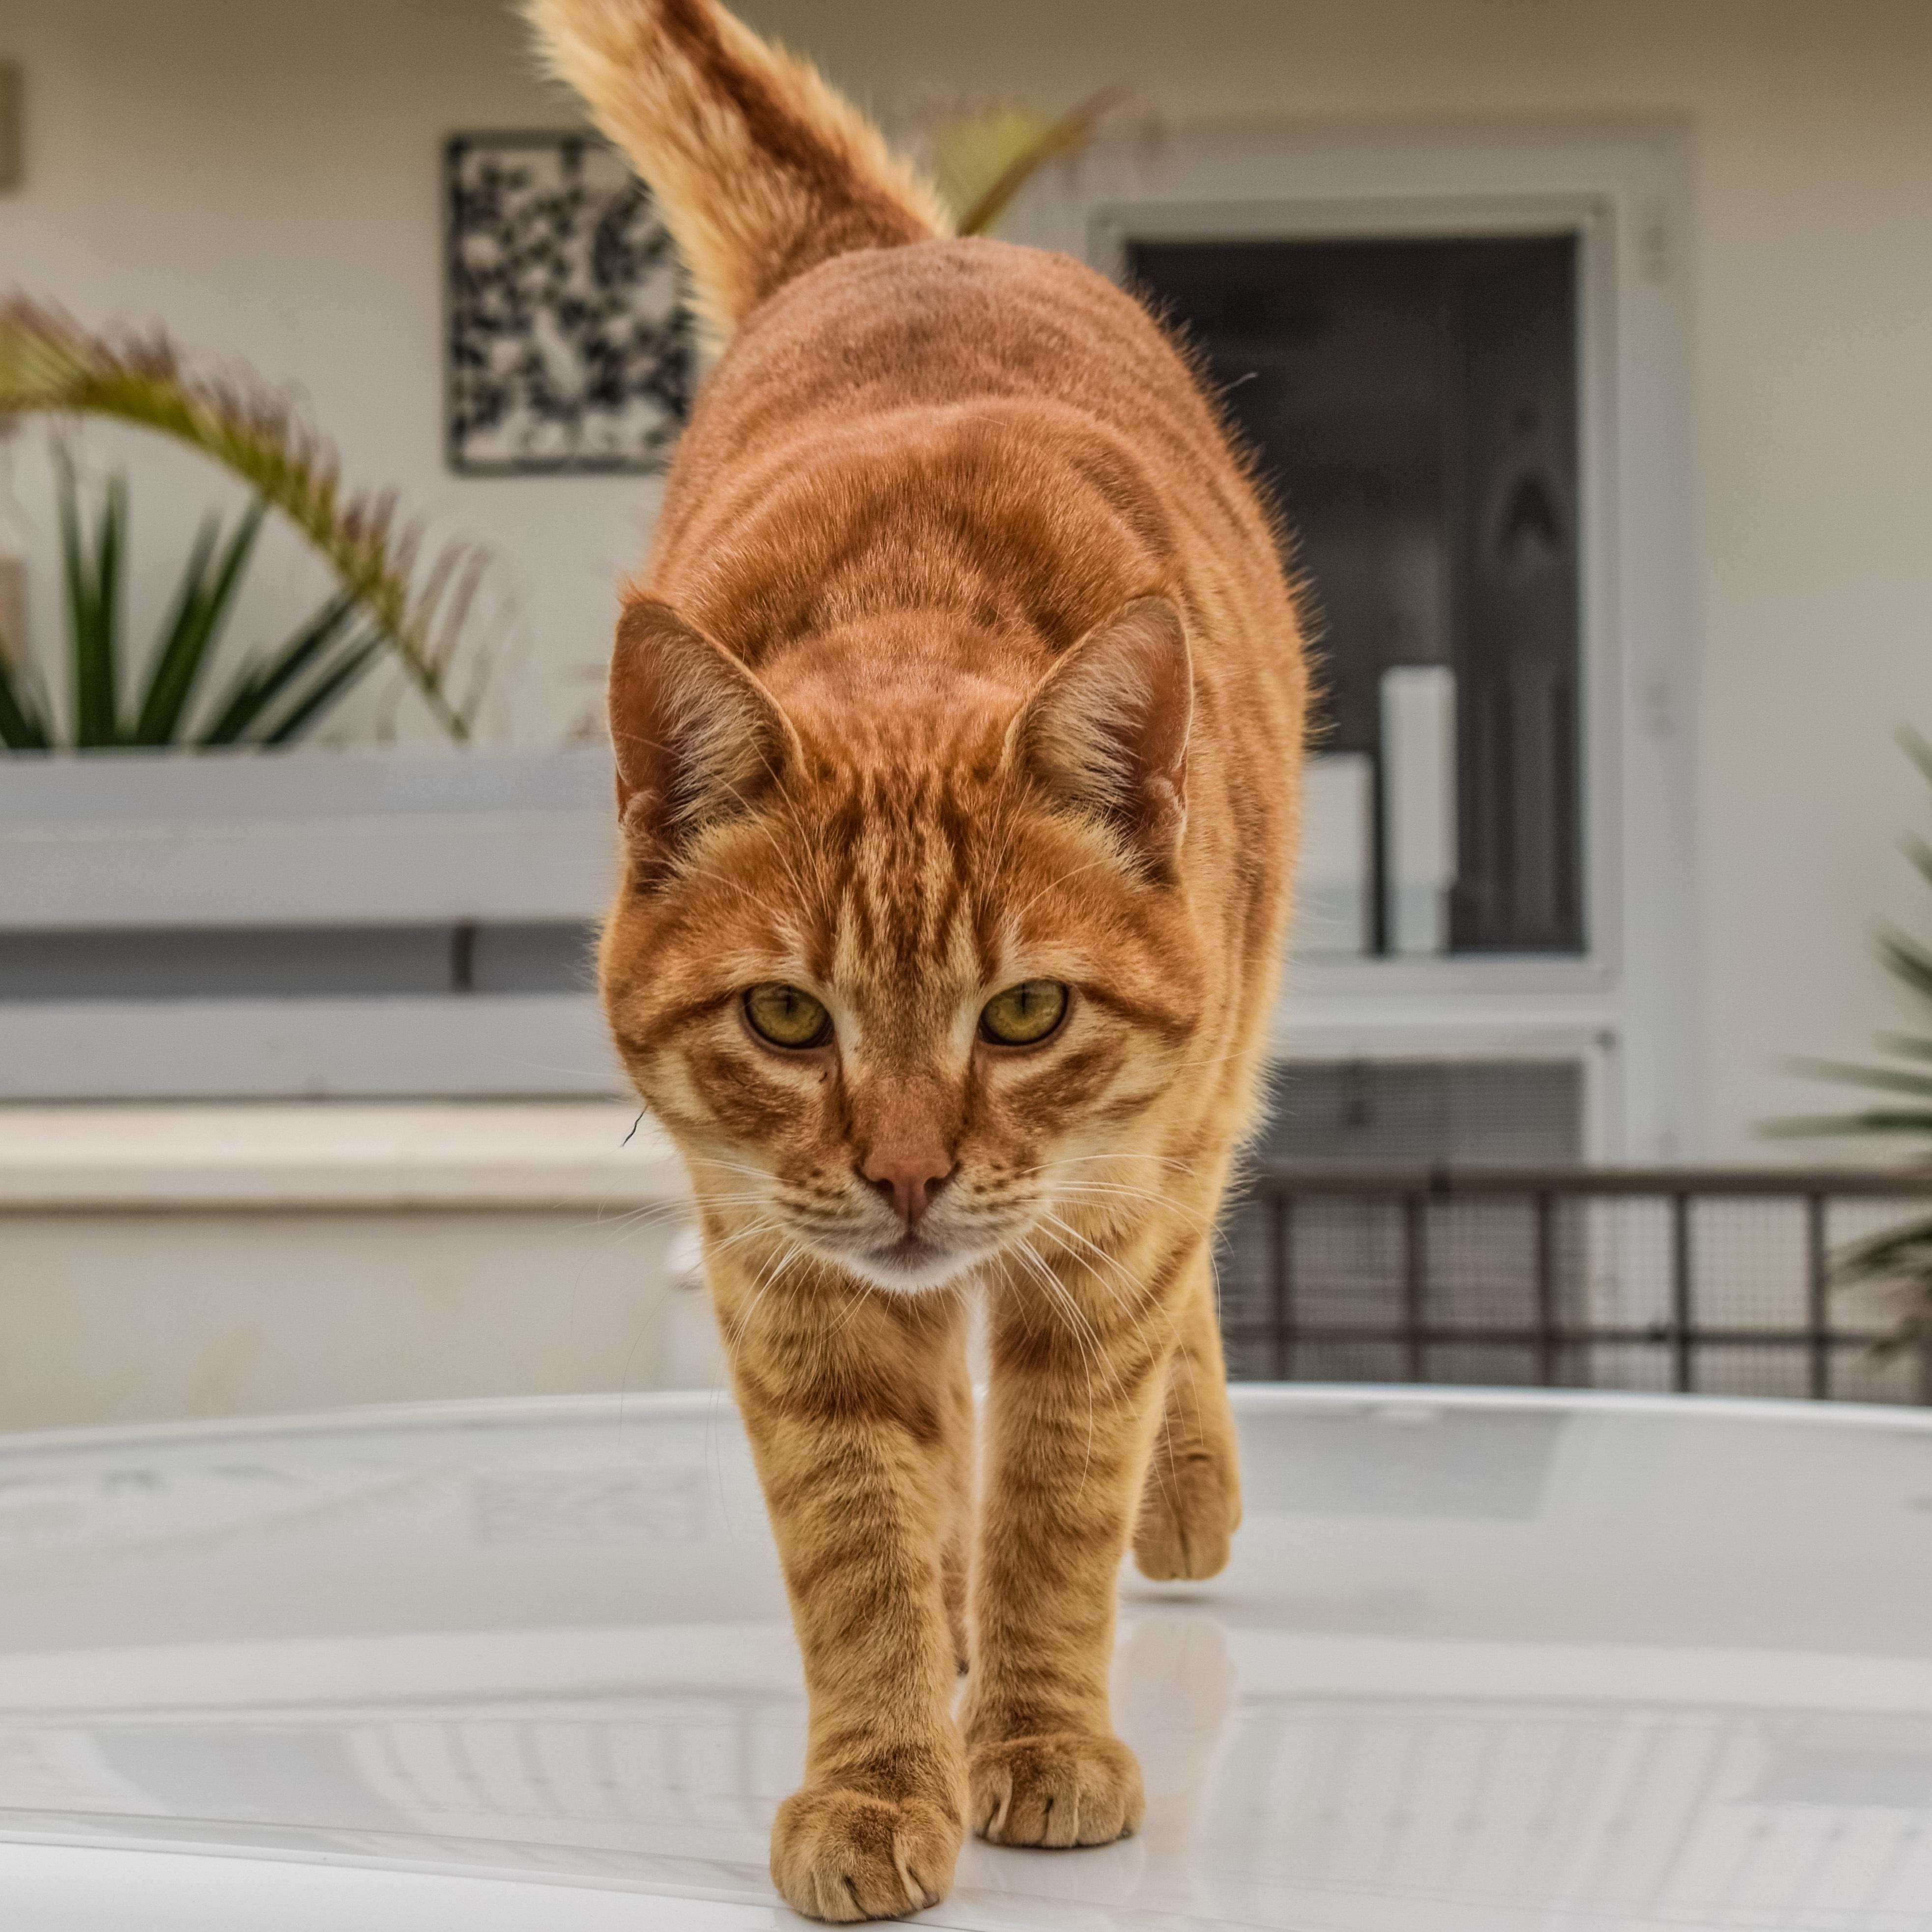 Free Images Outdoor Animal Cute Looking Pet Orange Kitten